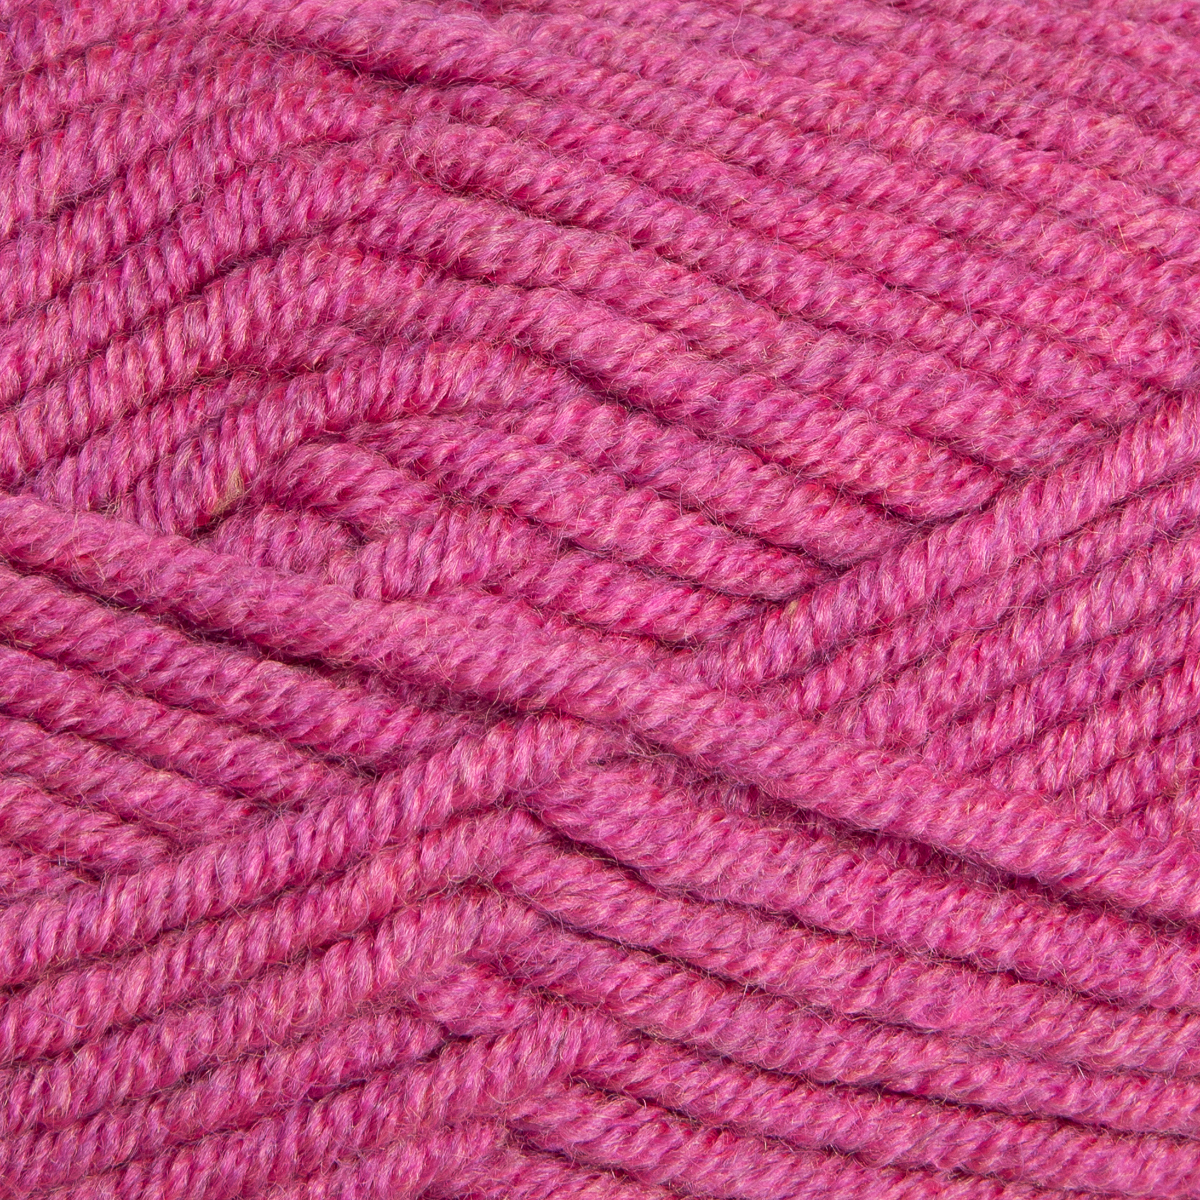 3pk-Lion-Brand-Woolspun-Acrylic-amp-Wool-Yarn-Bulky-5-Knit-Crocheting-Skeins-Soft thumbnail 63